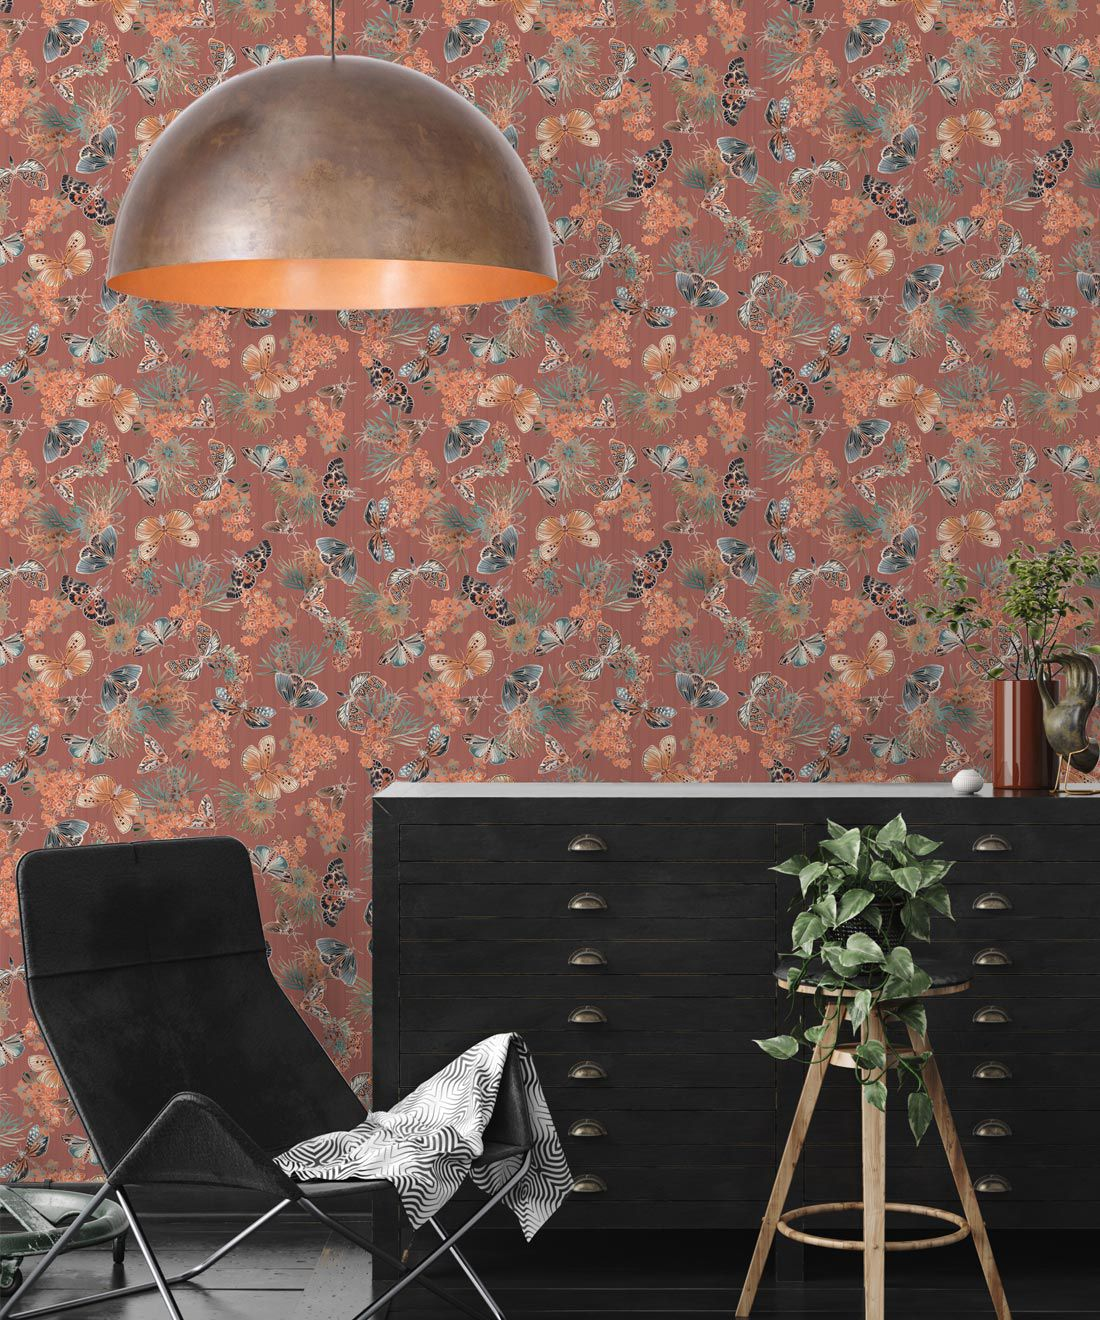 Moth Wallpaper • Eloise Short • Vintage Floral Wallpaper •Granny Chic Wallpaper • Grandmillennial Style Wallpaper •Rosewood •Insitu